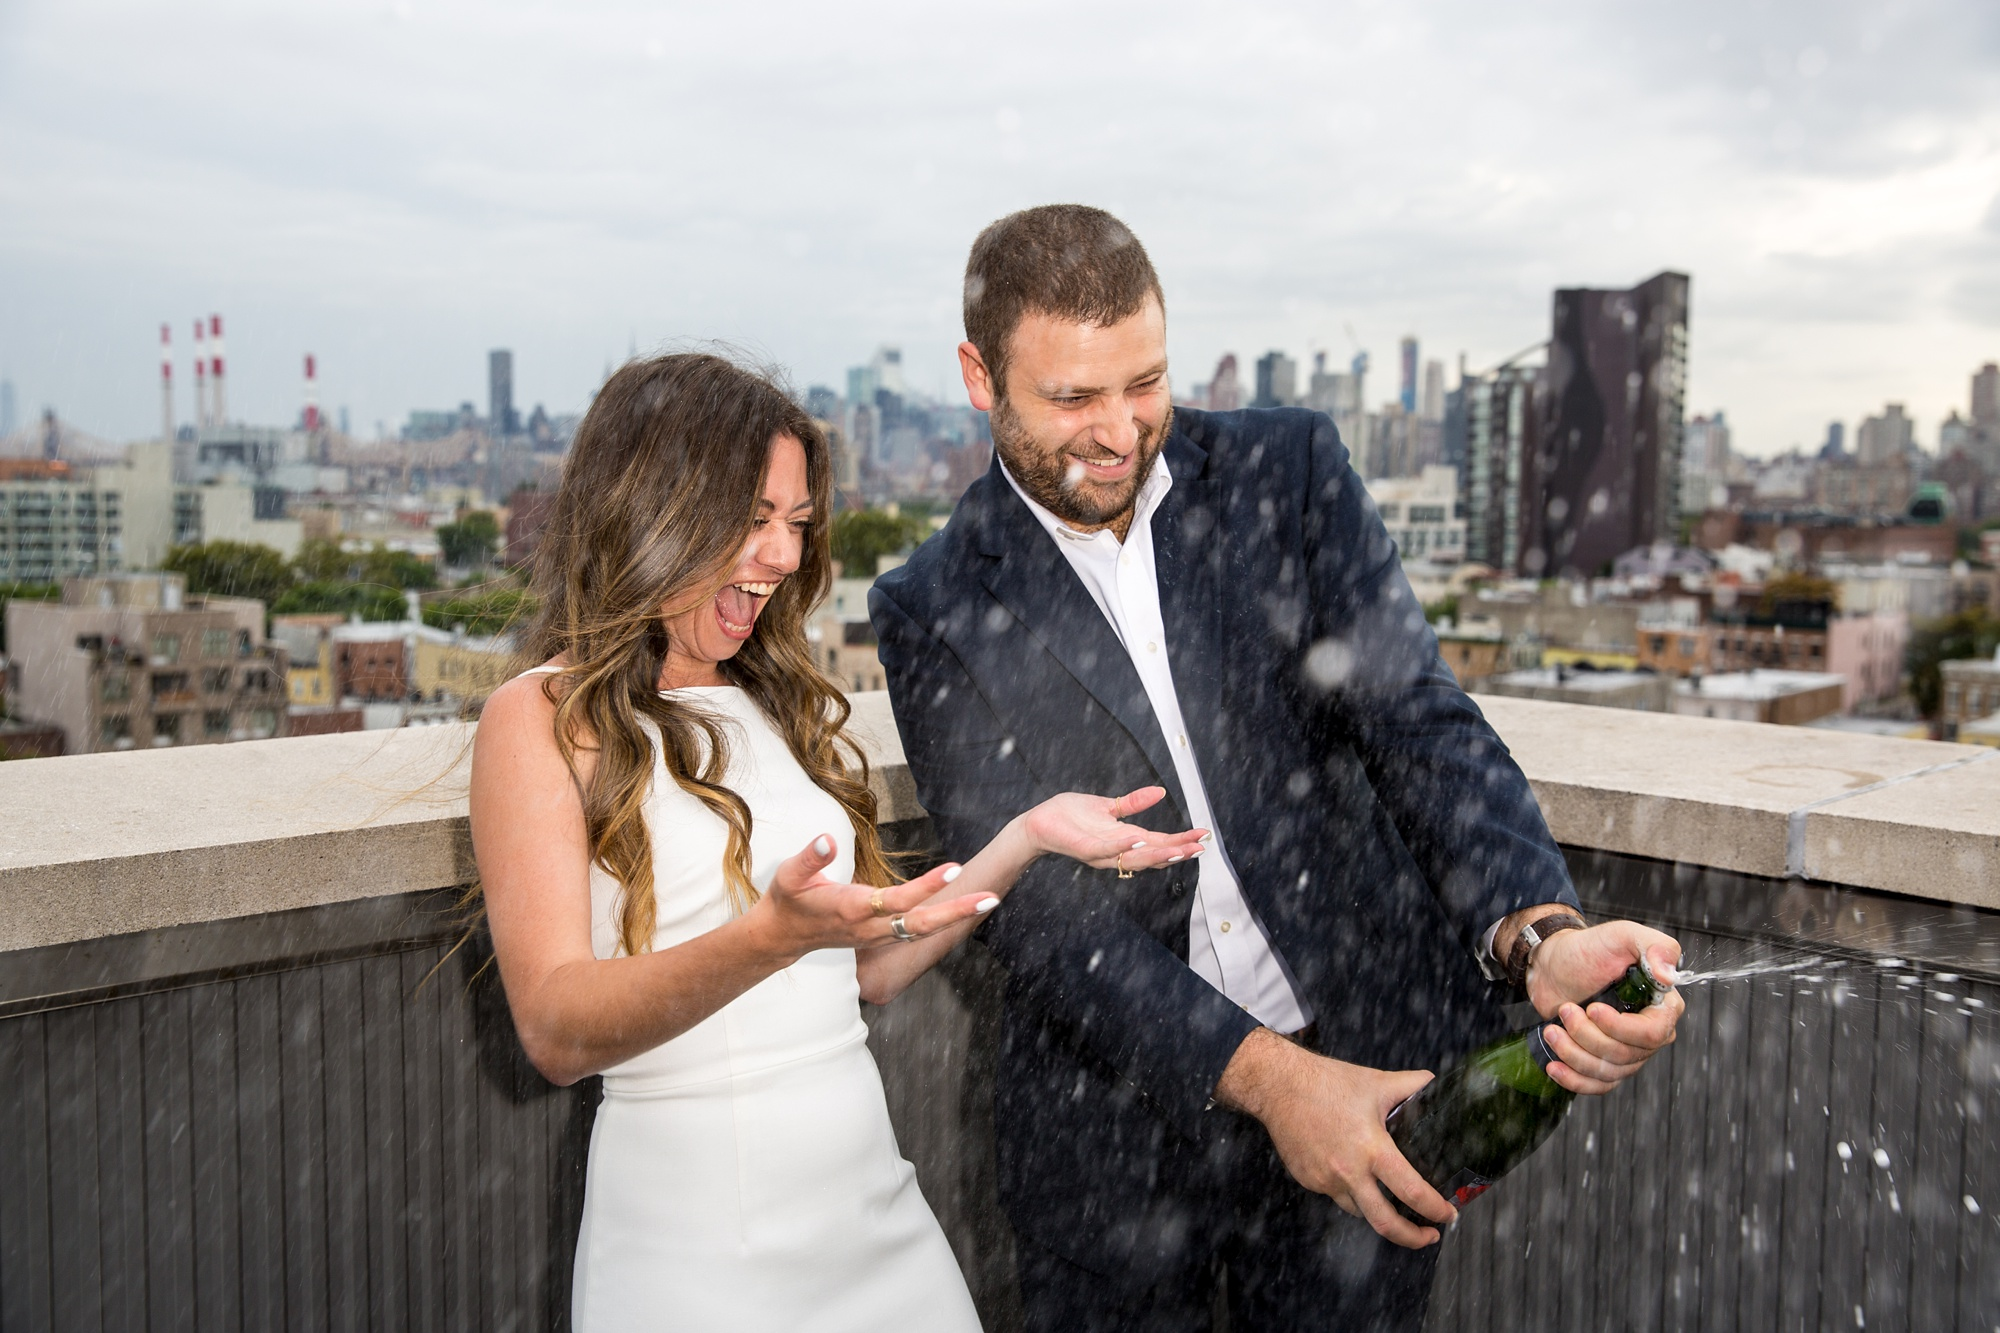 Astoria NYC Engagement Photo Session Shoot Wedding